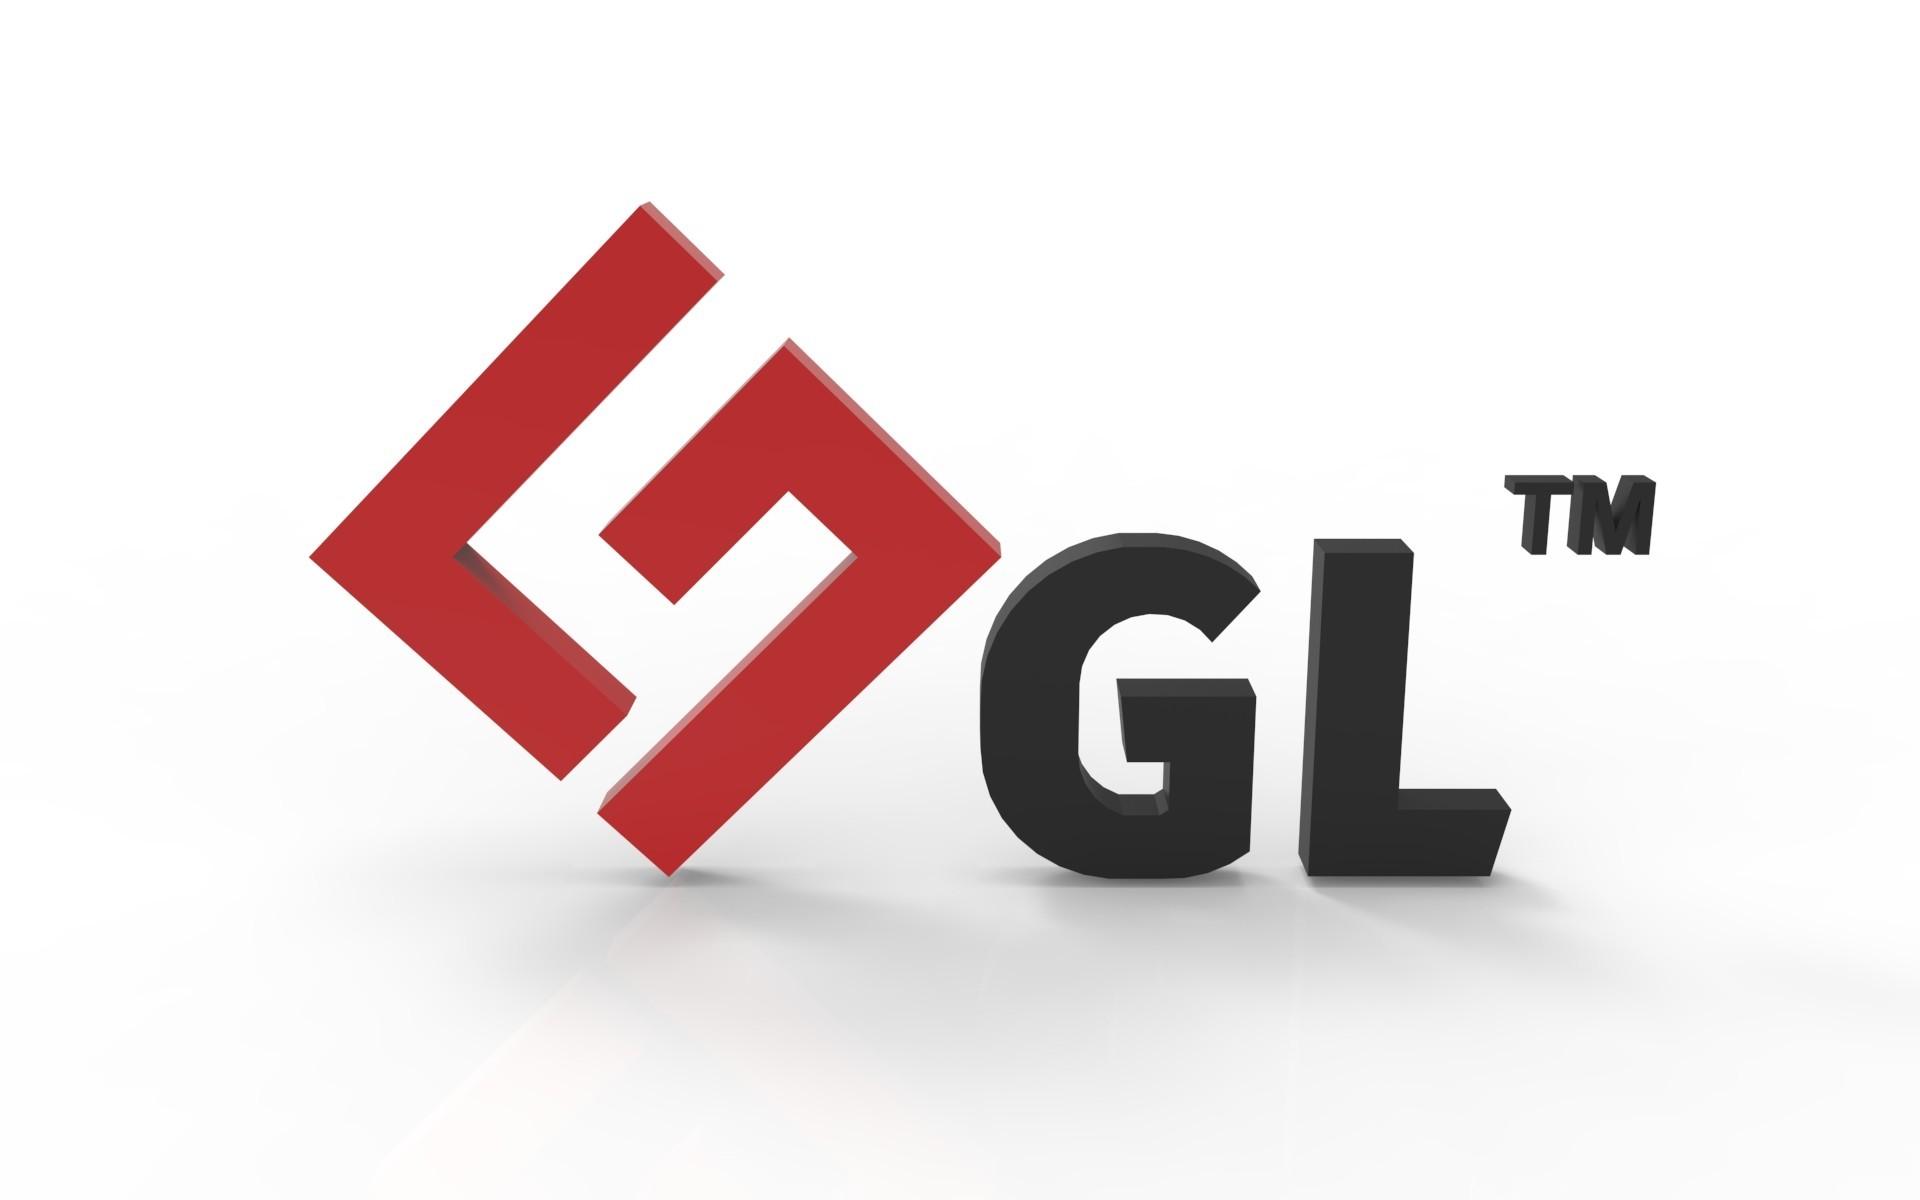 GL-GENERAL